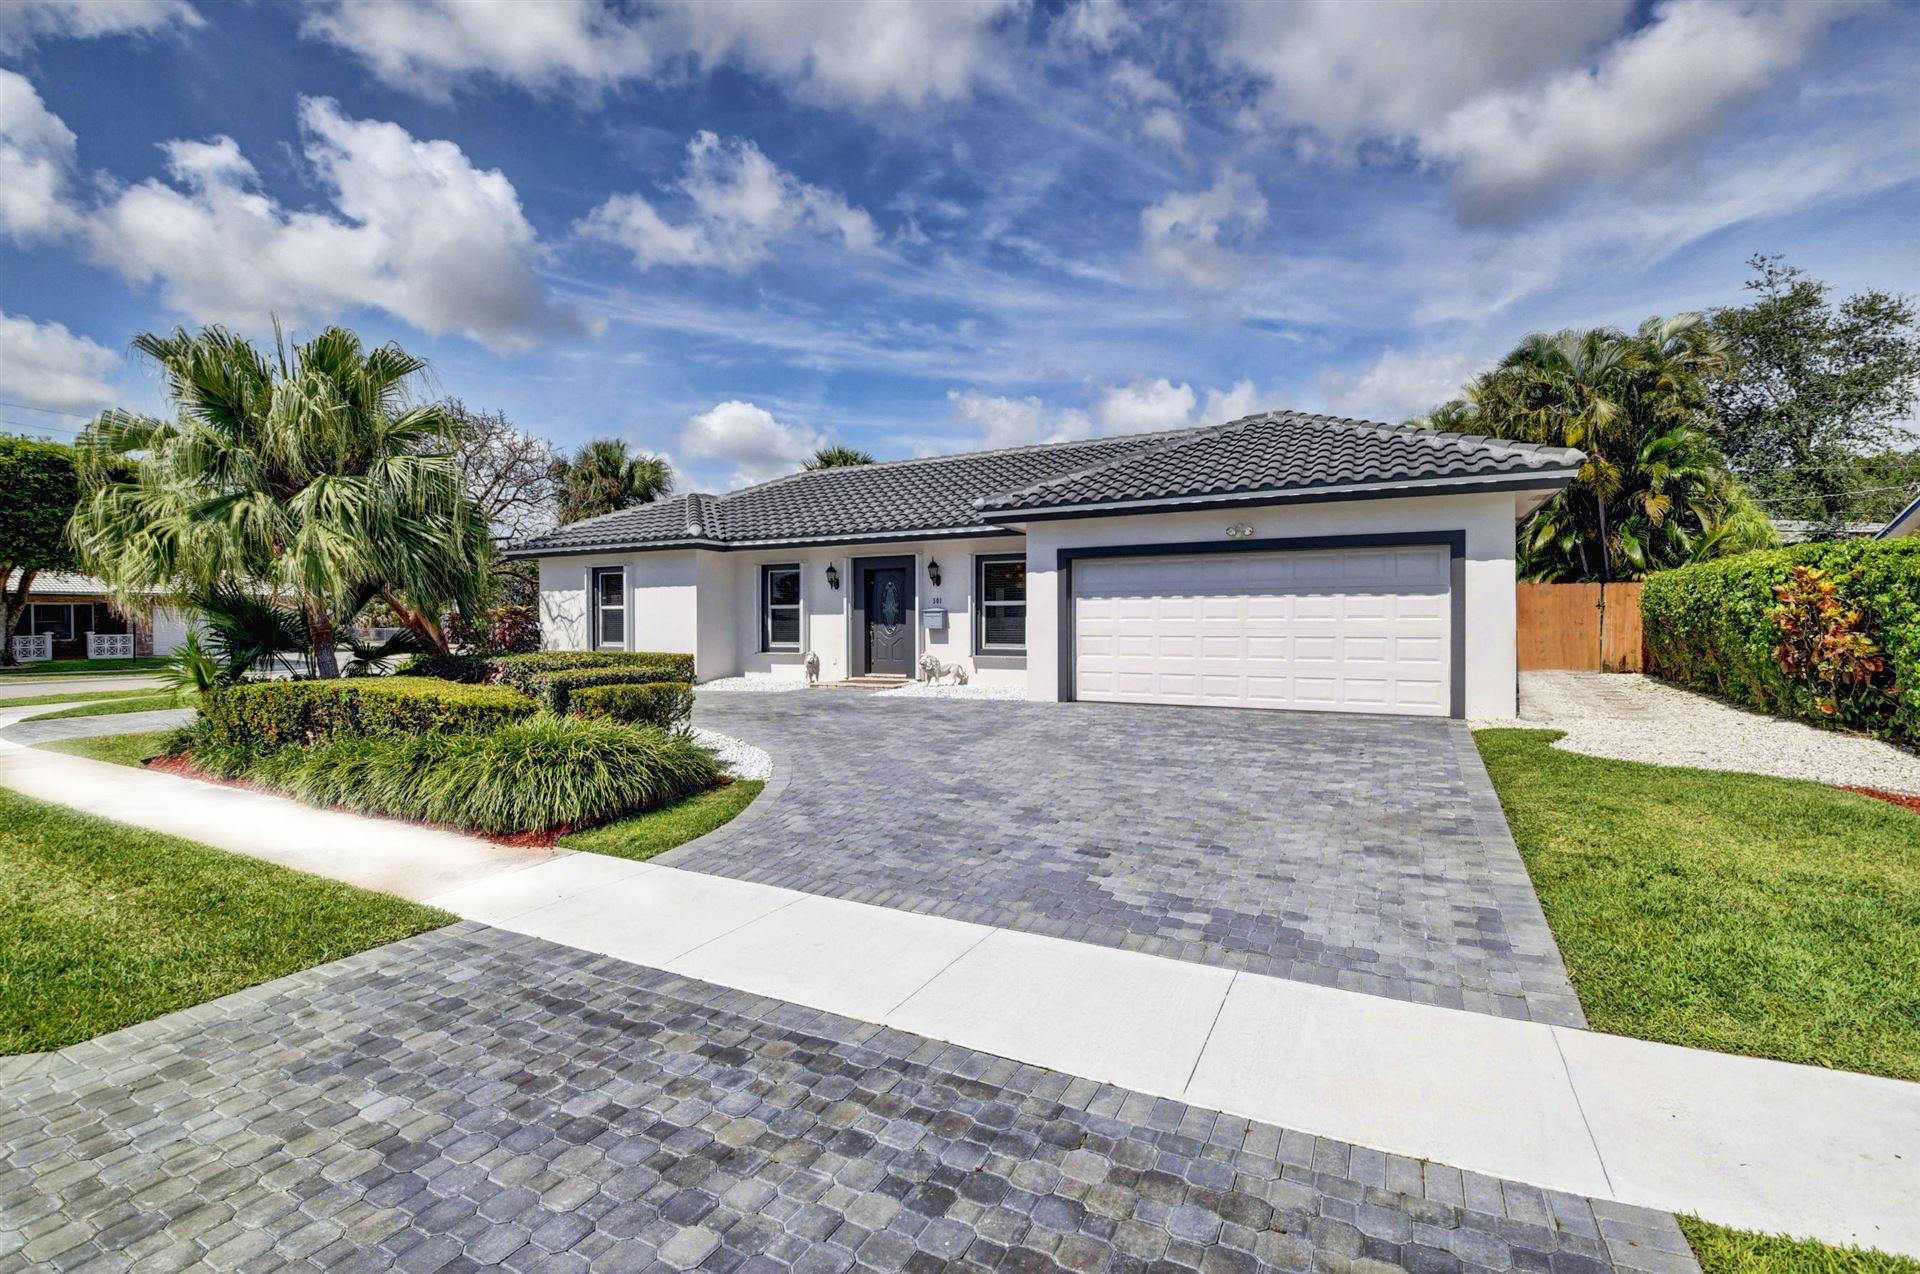 501 NW 15th Court, Boca Raton, FL 33486 - MLS#: RX-10713561